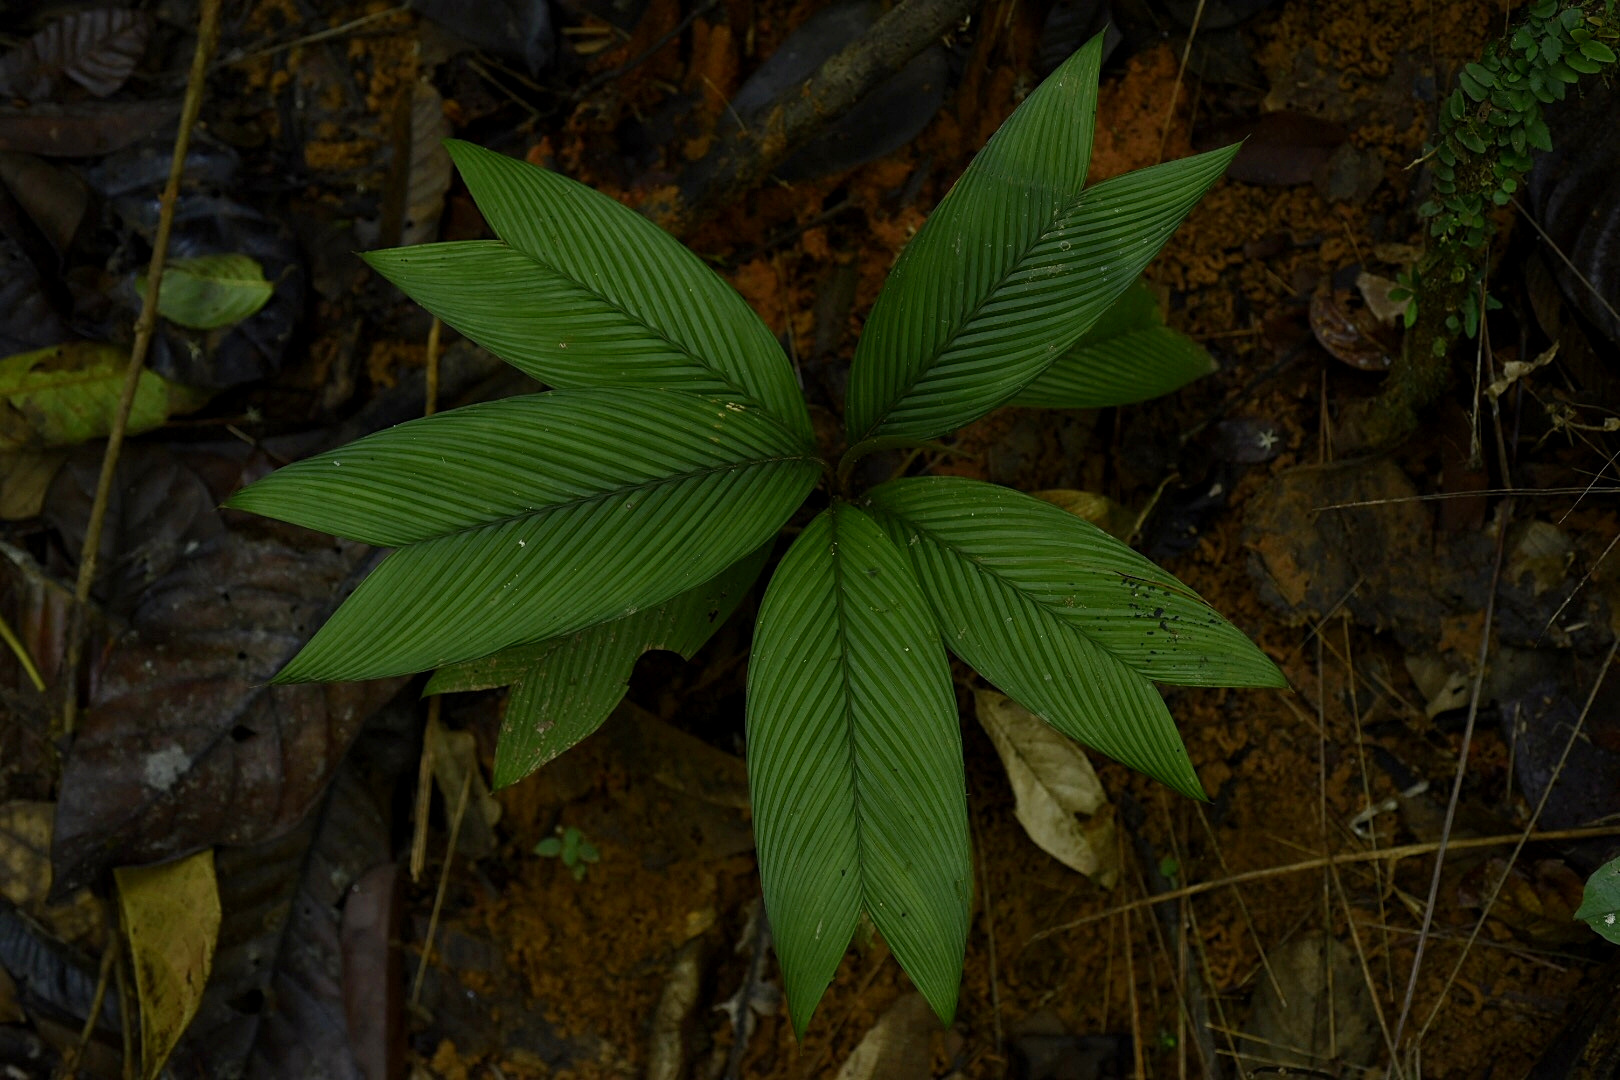 Juvenile  Geonoma cuneata subsp. indivisa , Guna Yala Comarca, Panamá (Image F. Muller).